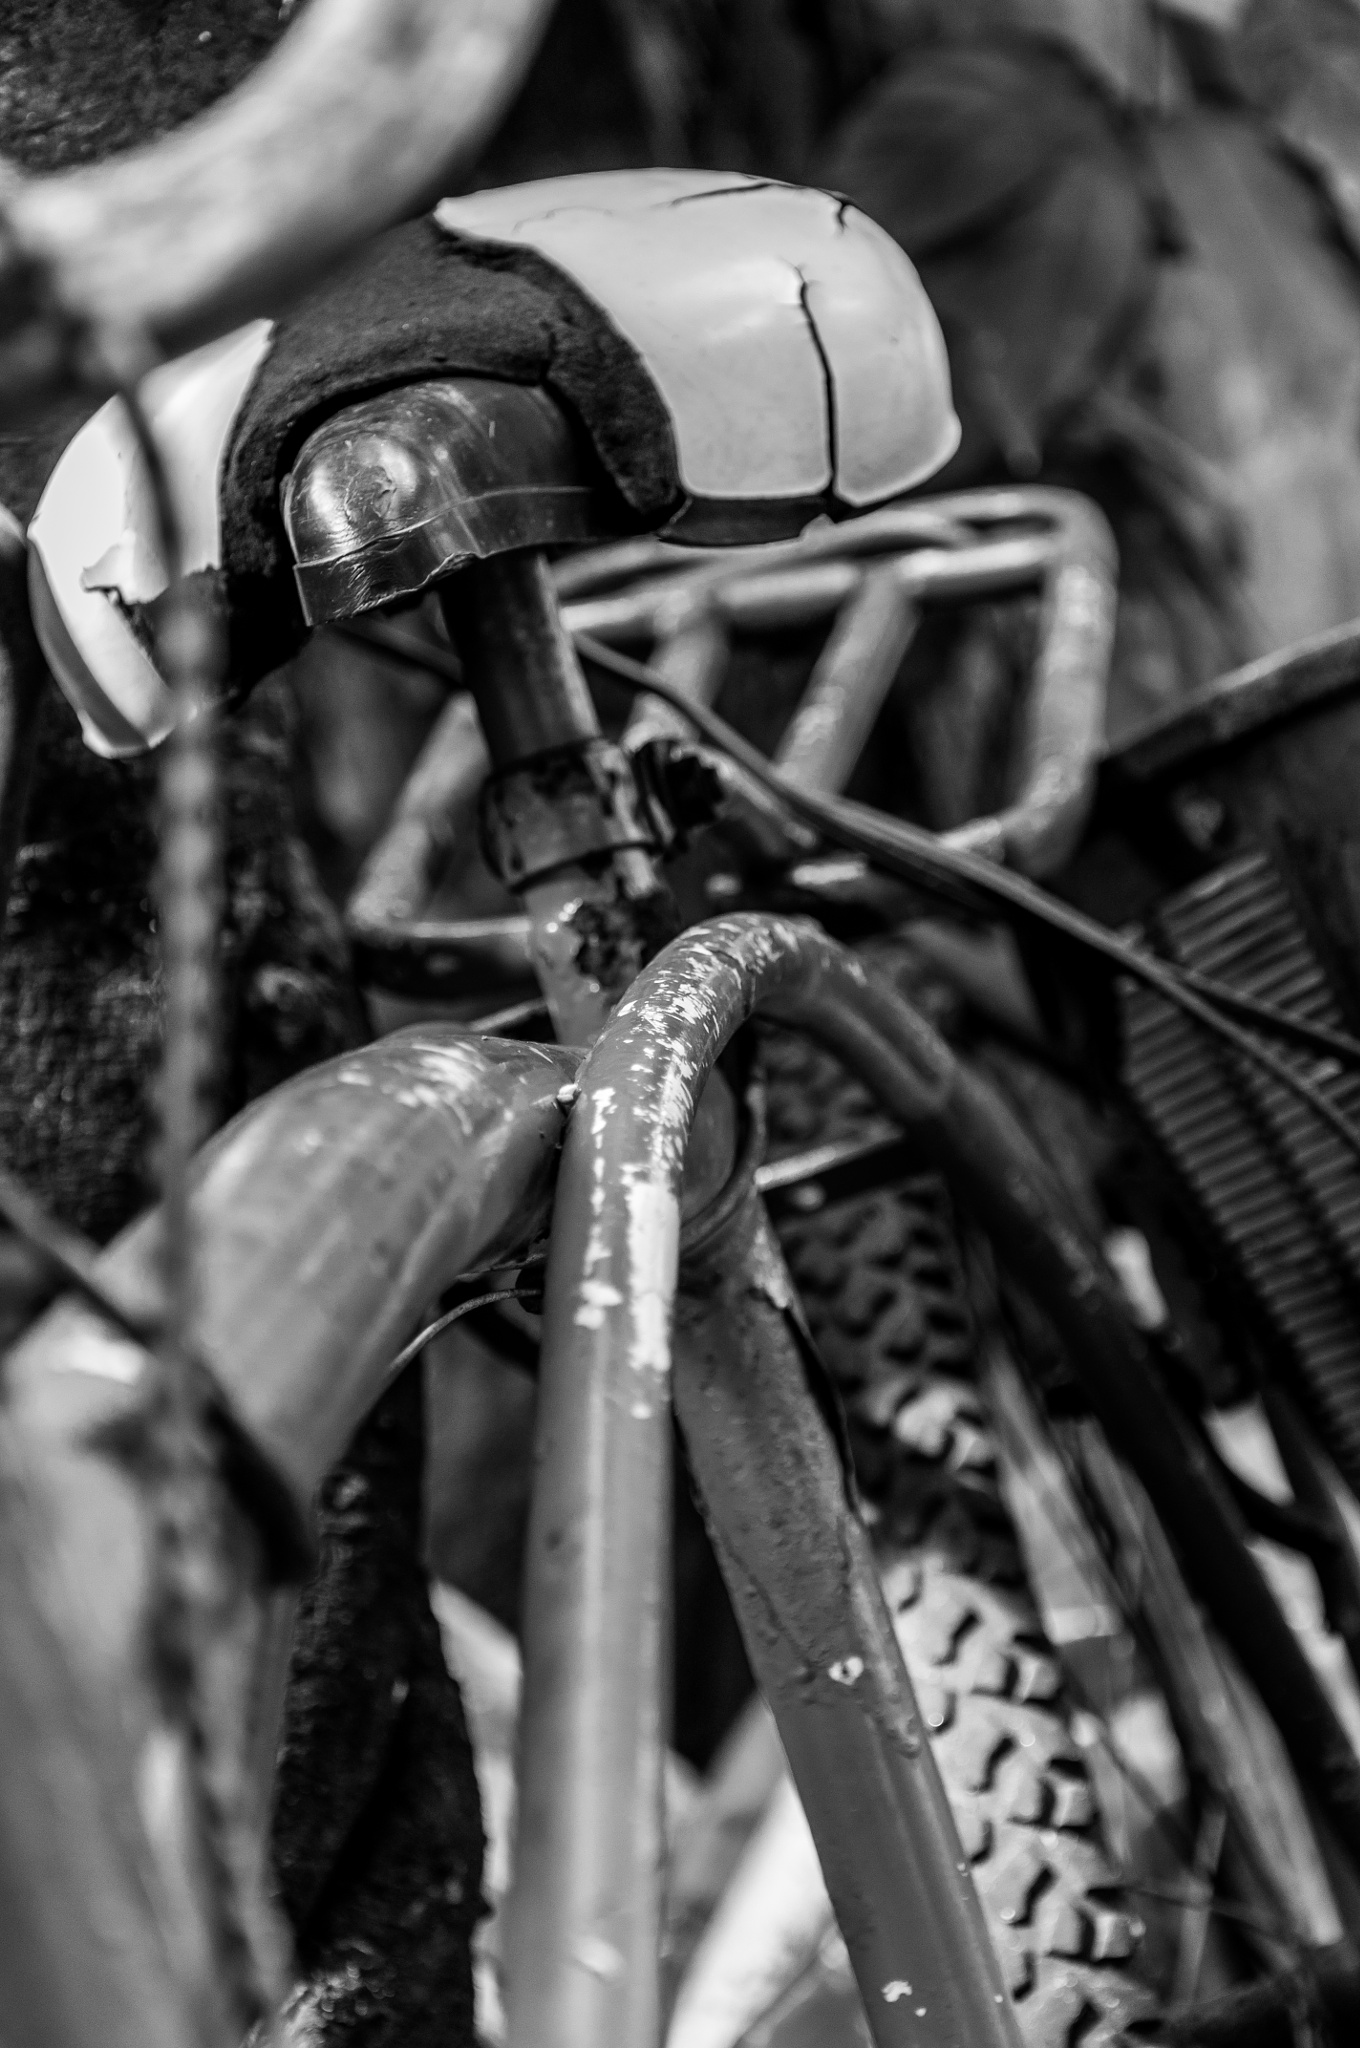 Bicicleta Velha by Valmirez